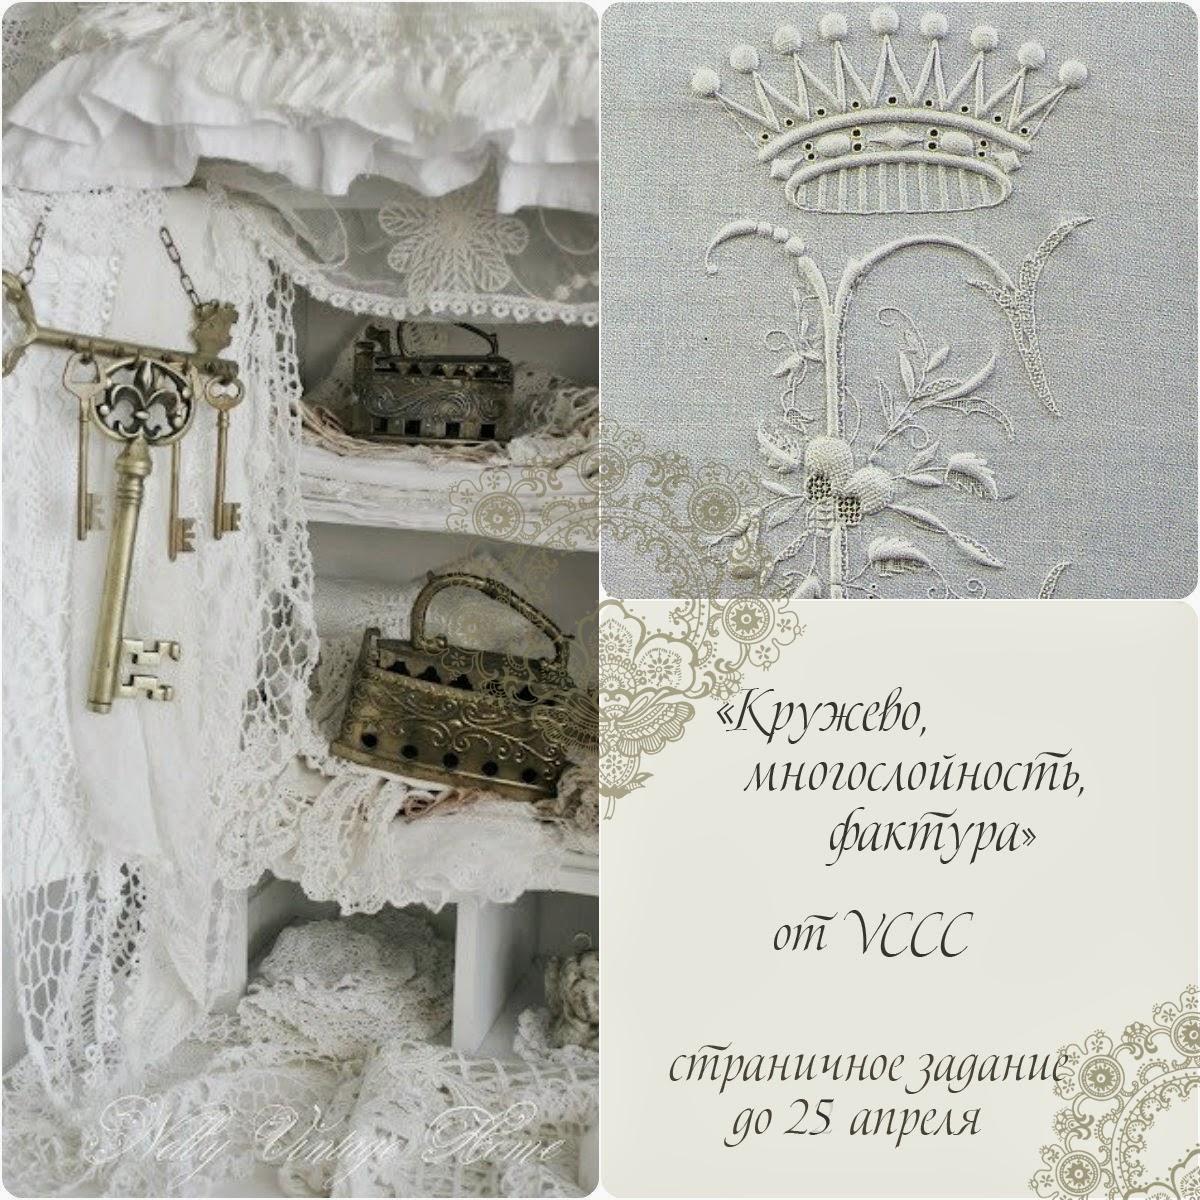 http://vintagecafecard.blogspot.ru/2014/03/blog-post_26.html